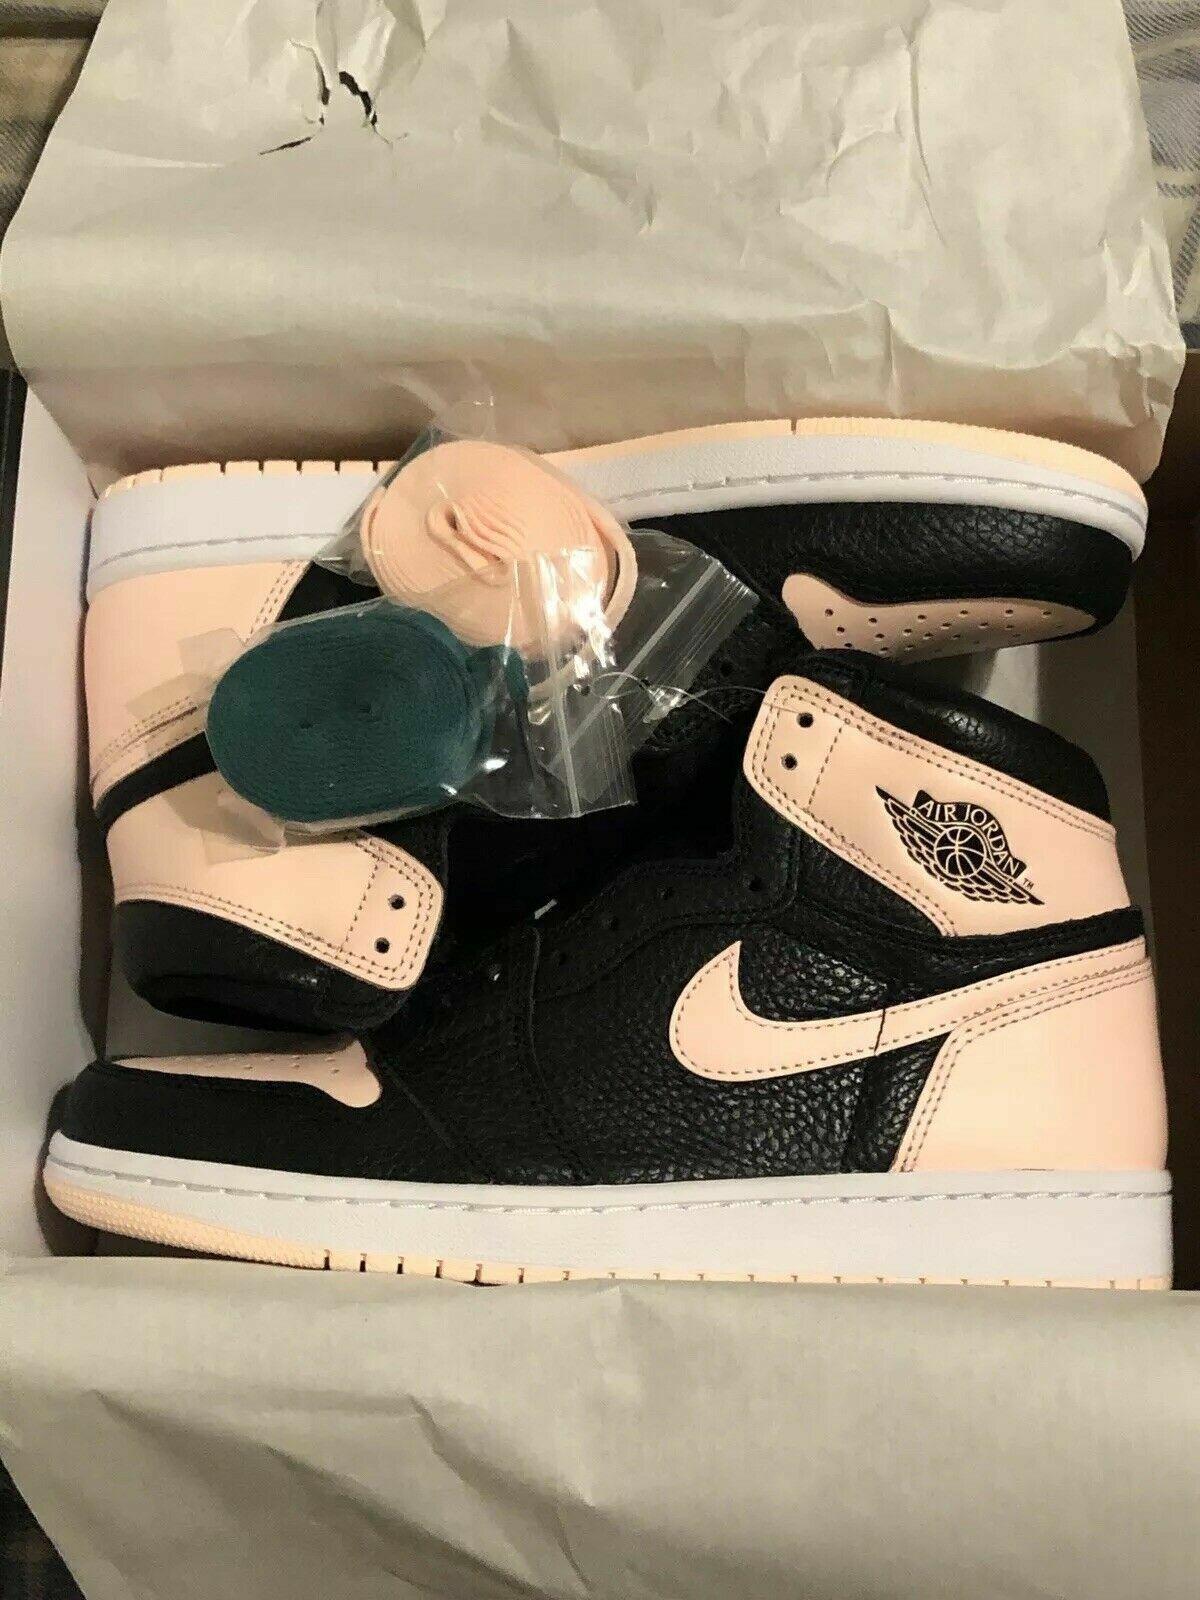 Nike Air Jordan Retro I 1 HIGH OG Crimson Tint Black Pink 555088-081 Size  4y-14